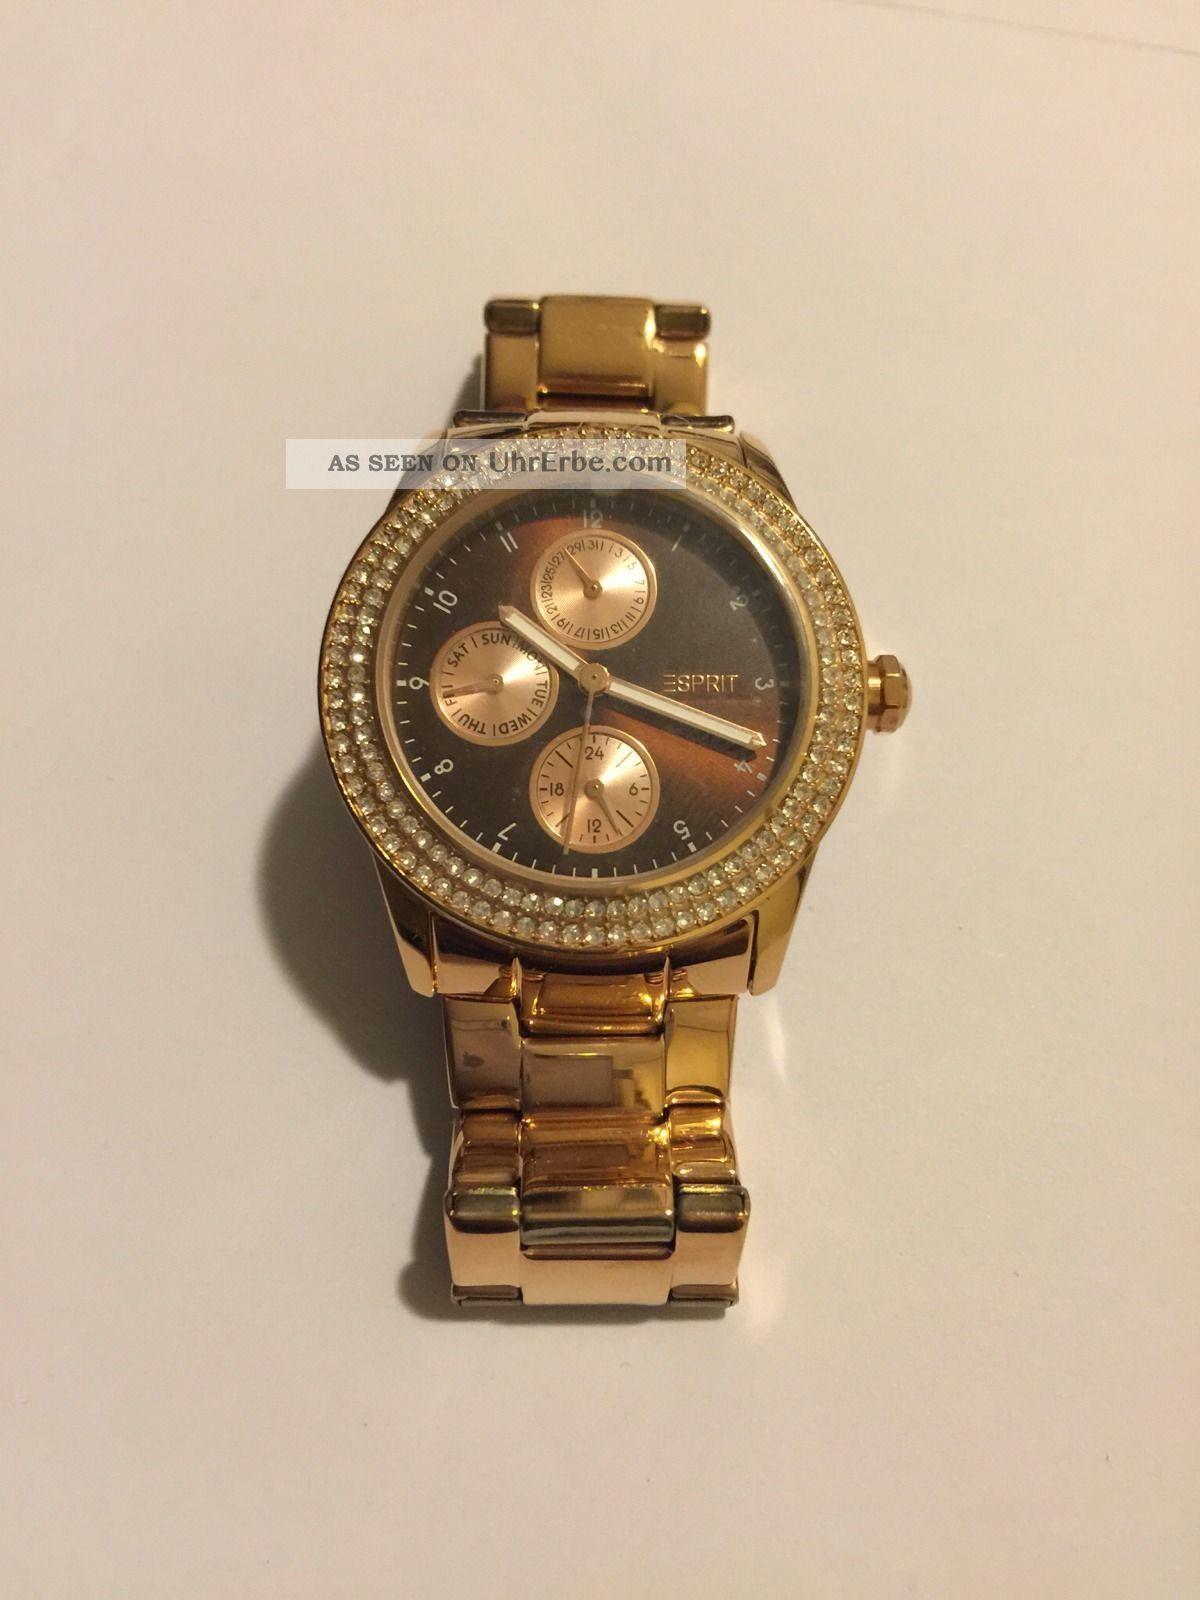 Goldene Esprit Damenuhr Braunes Ziffernblatt Armbanduhren Bild